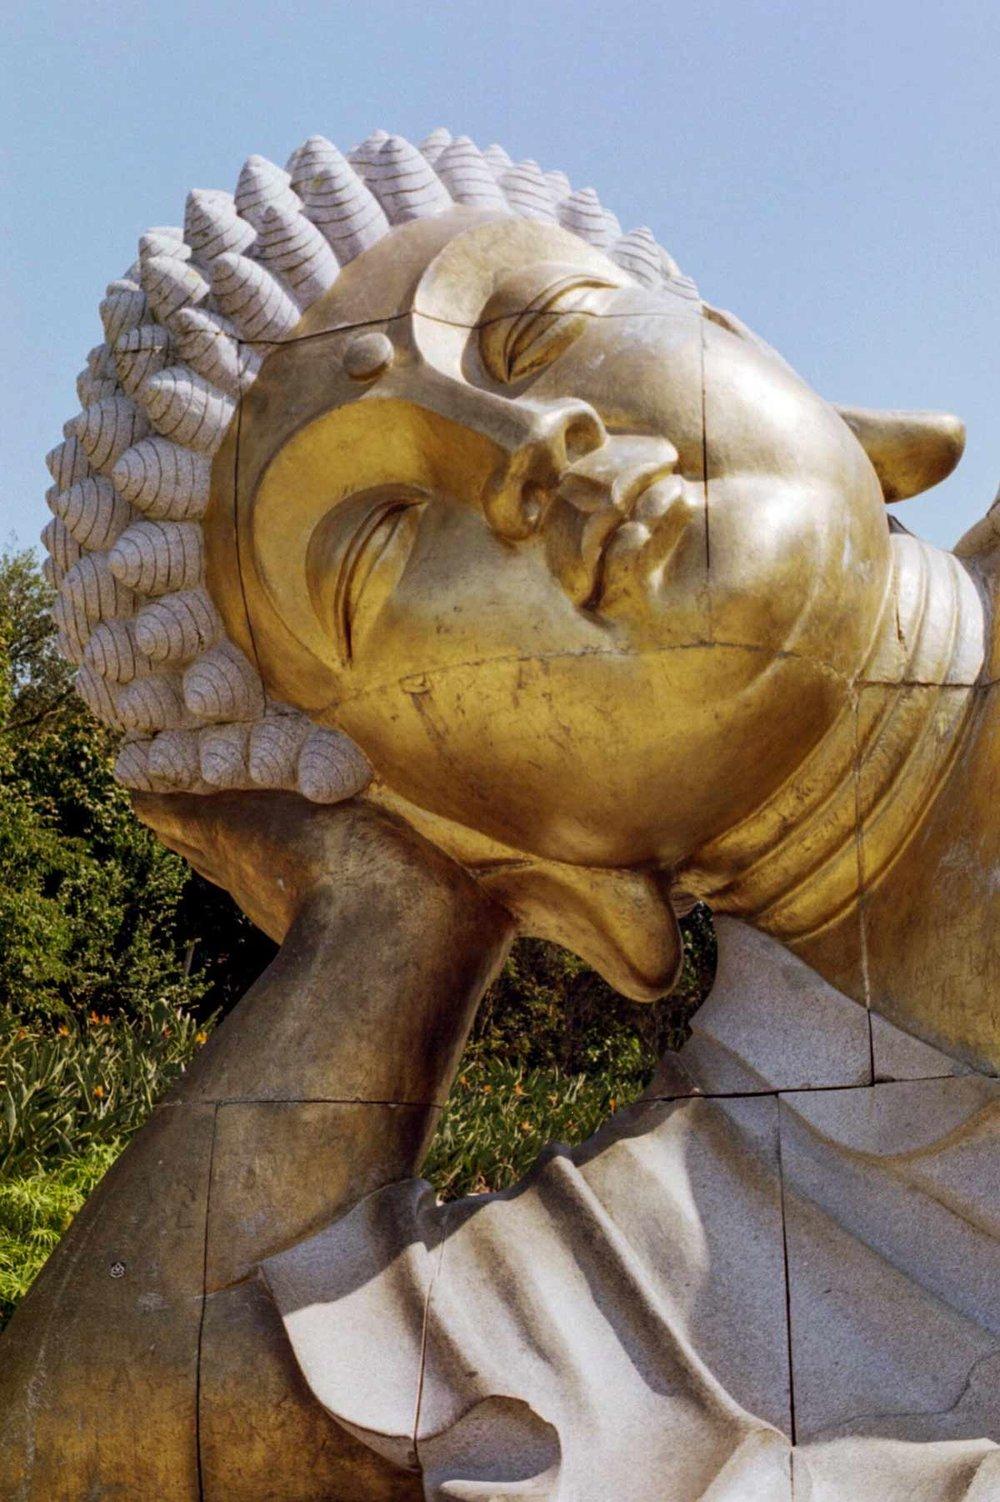 BuddhaEdenPortugalWildWeRoam_0021.jpg